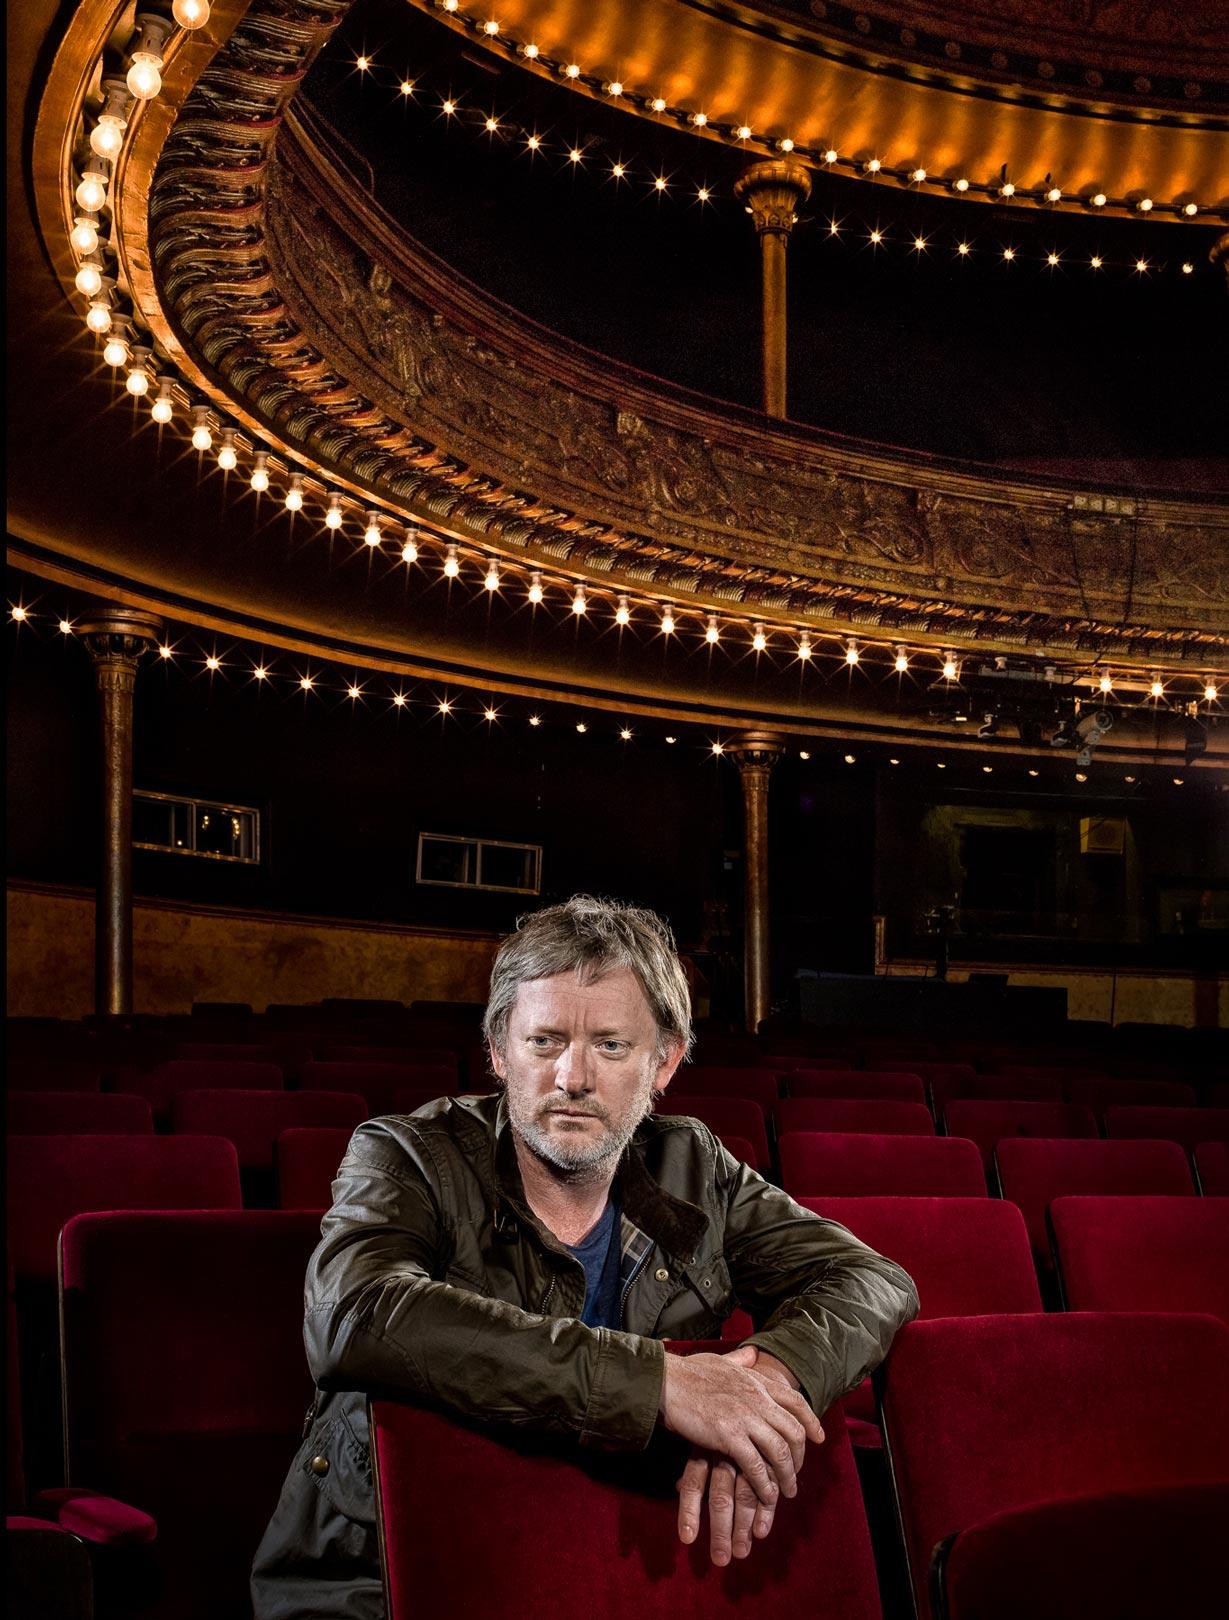 Dougie Henshall - Citizens Theatre, Glasgow